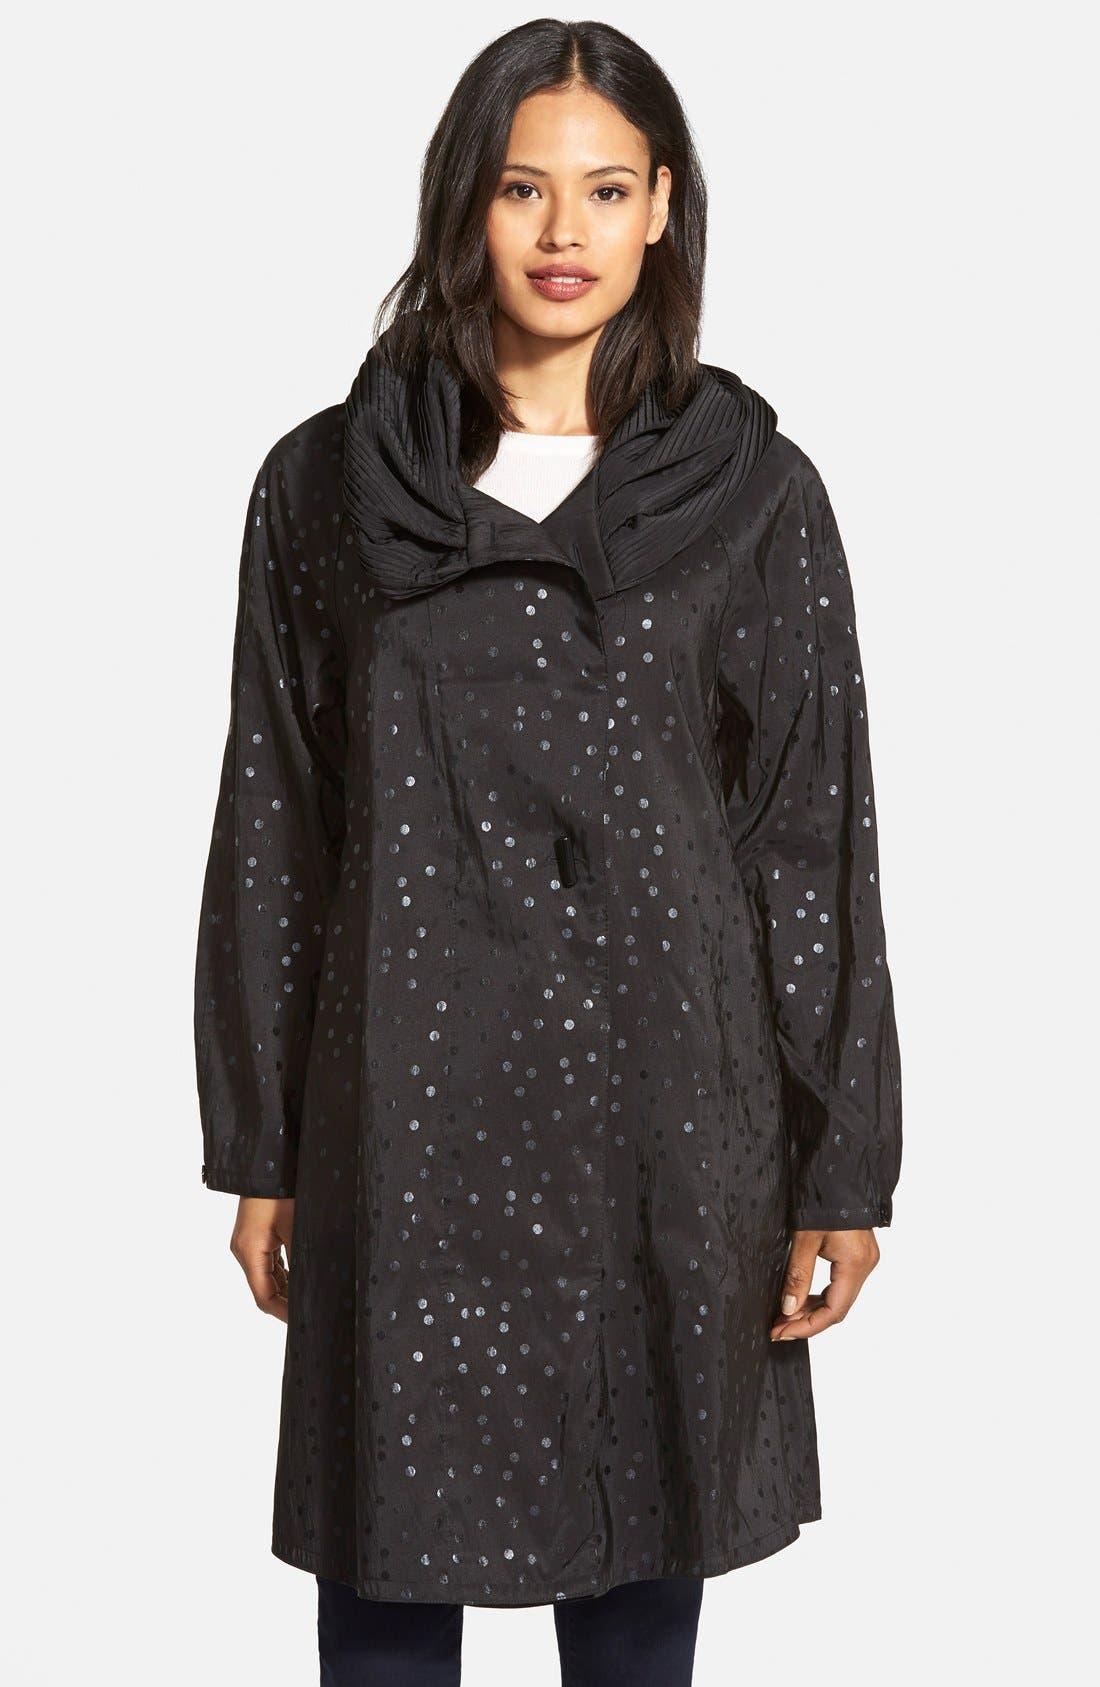 'Donatella' Reversible Dot Pleat Hood Packable Travel Coat,                             Main thumbnail 1, color,                             017